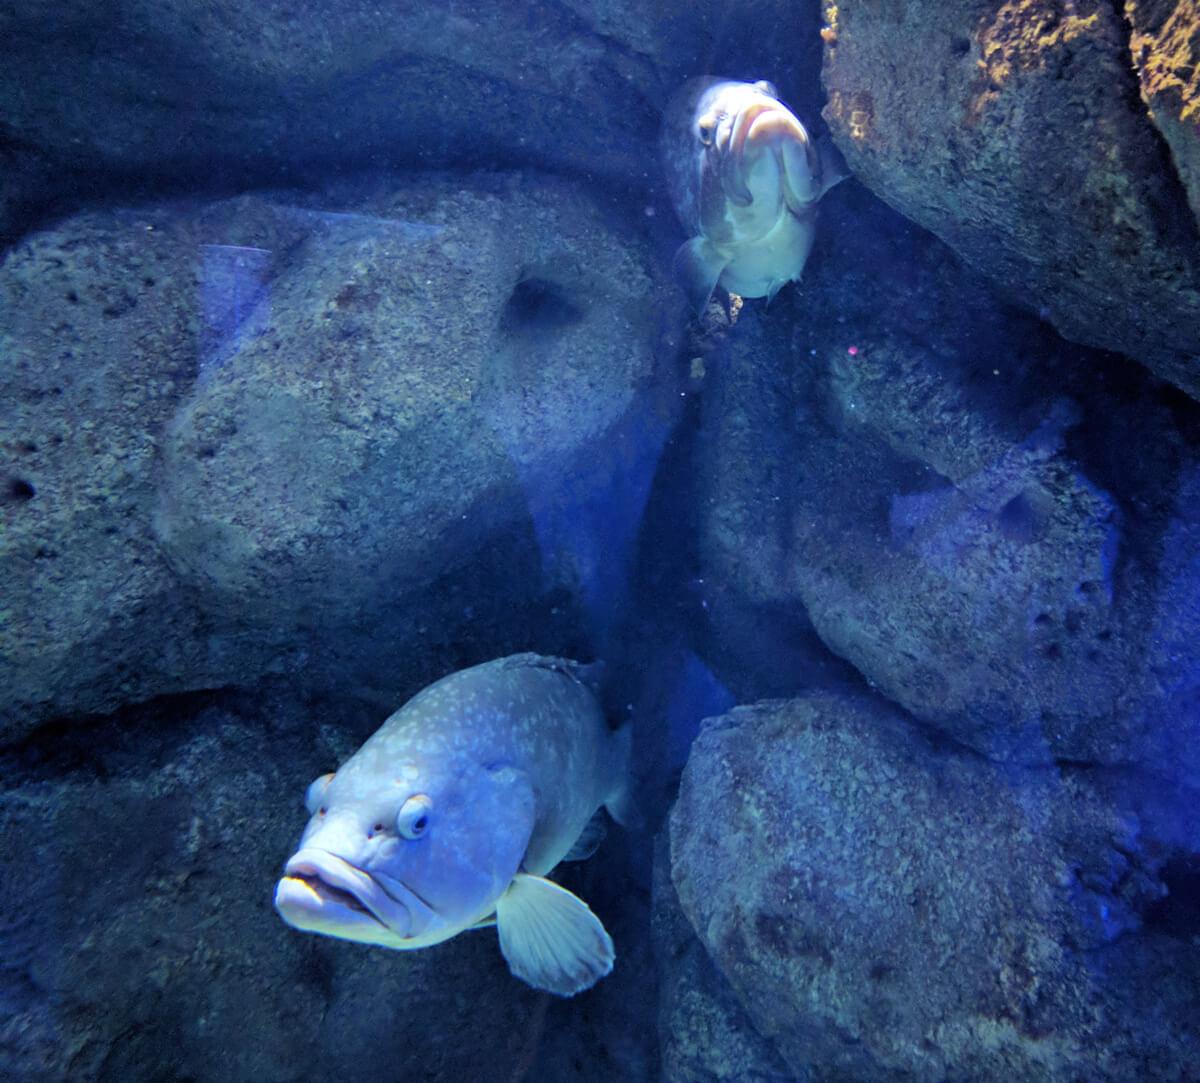 аквариум Крита находится недалеко от Ираклиона, в деревне Коккини Хани